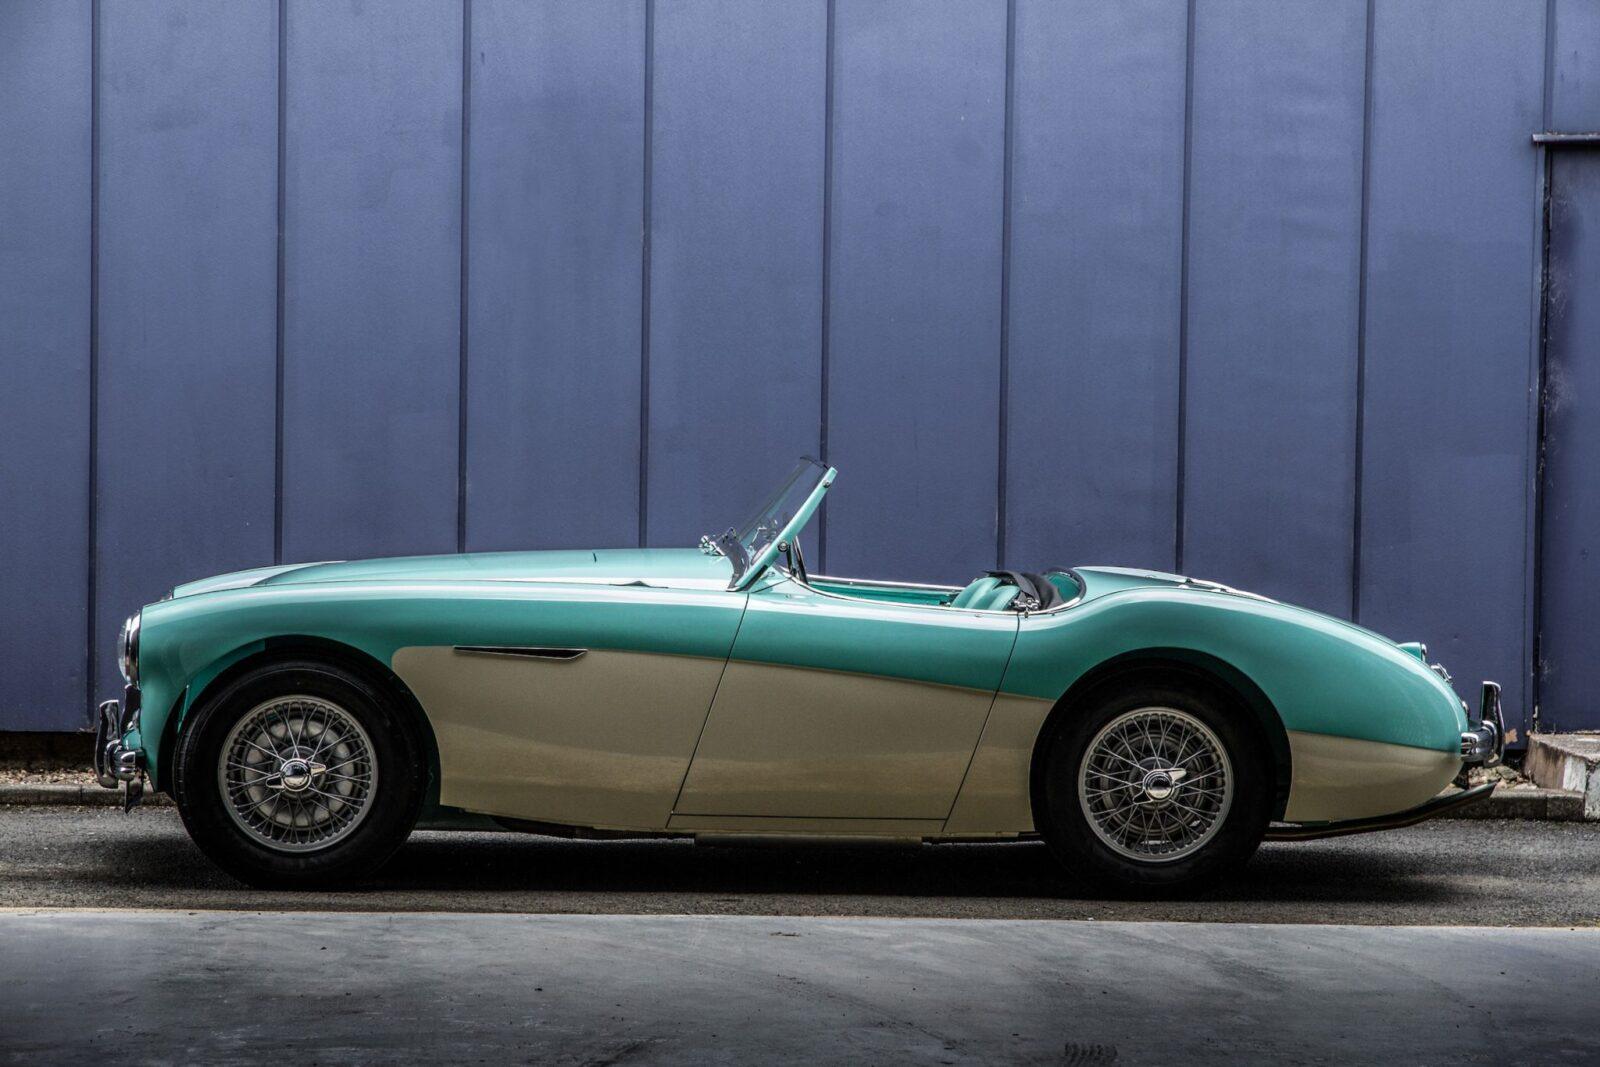 Austin Healey 1004 12 1600x1067 - The 1955 Earls Court Motor Show Car - Austin-Healey 100/4